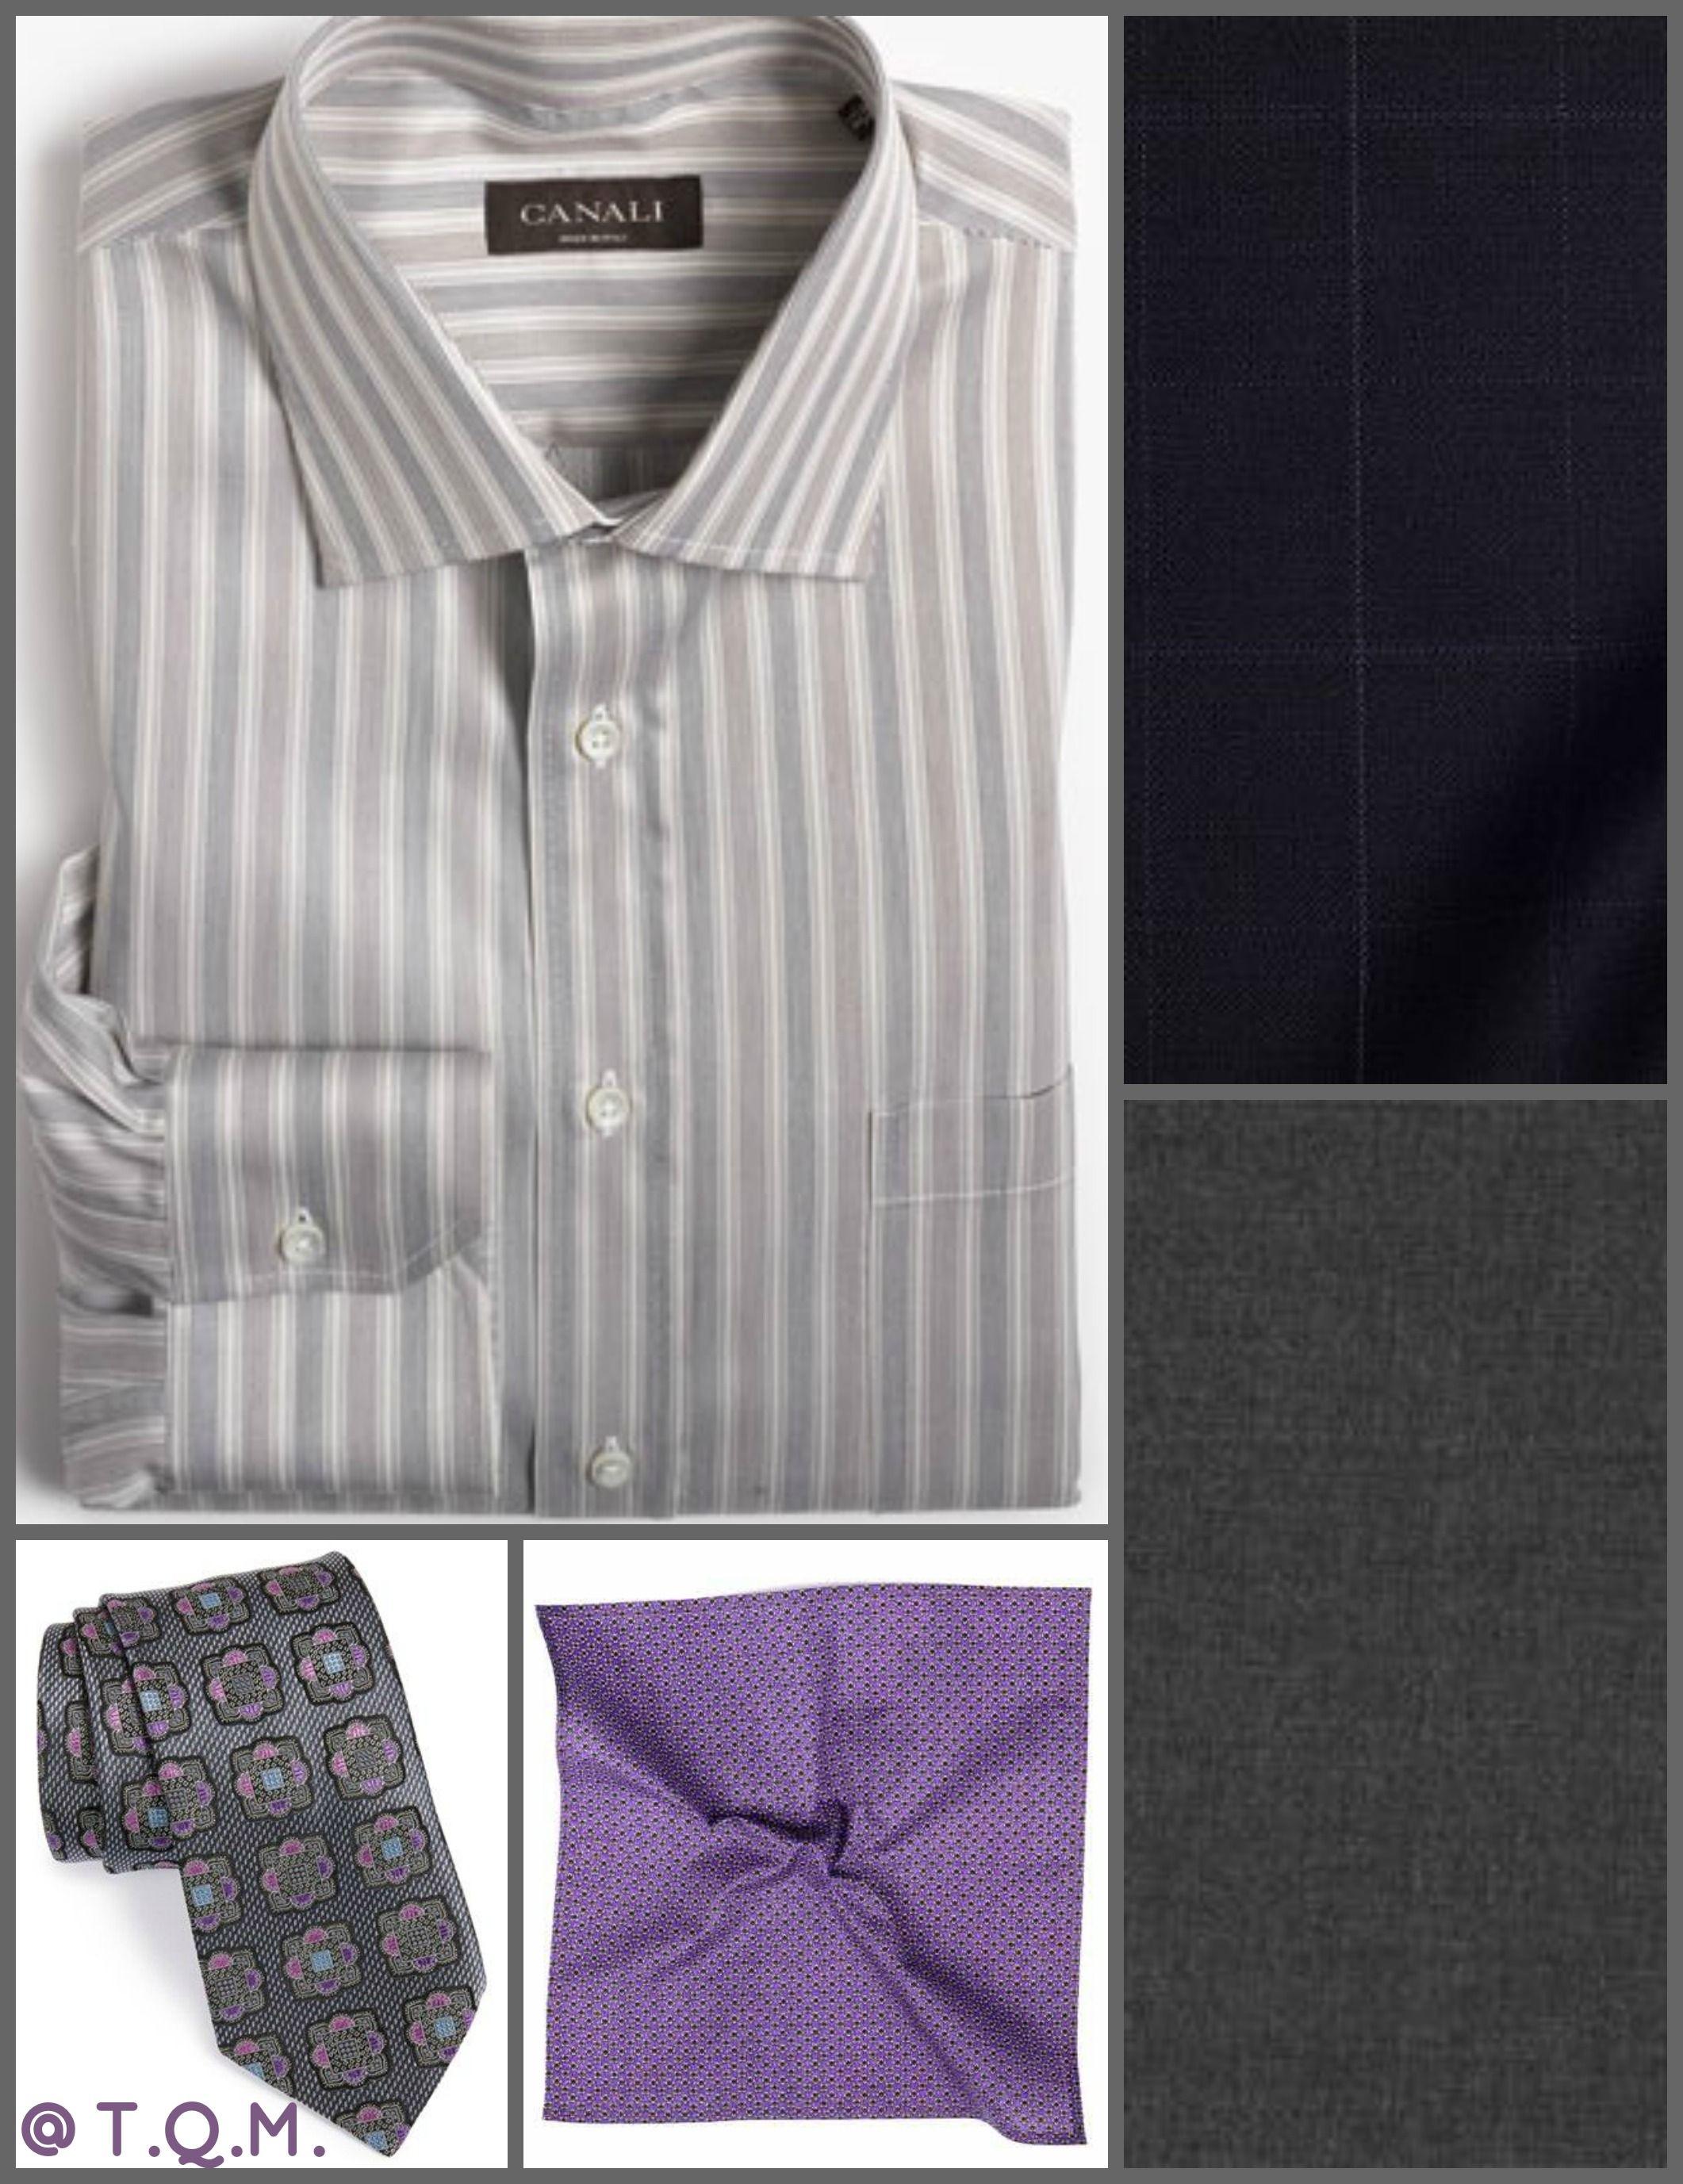 Shirttie Combo Canalishirt Ermenegildo Zegnatie Oliver Wicks